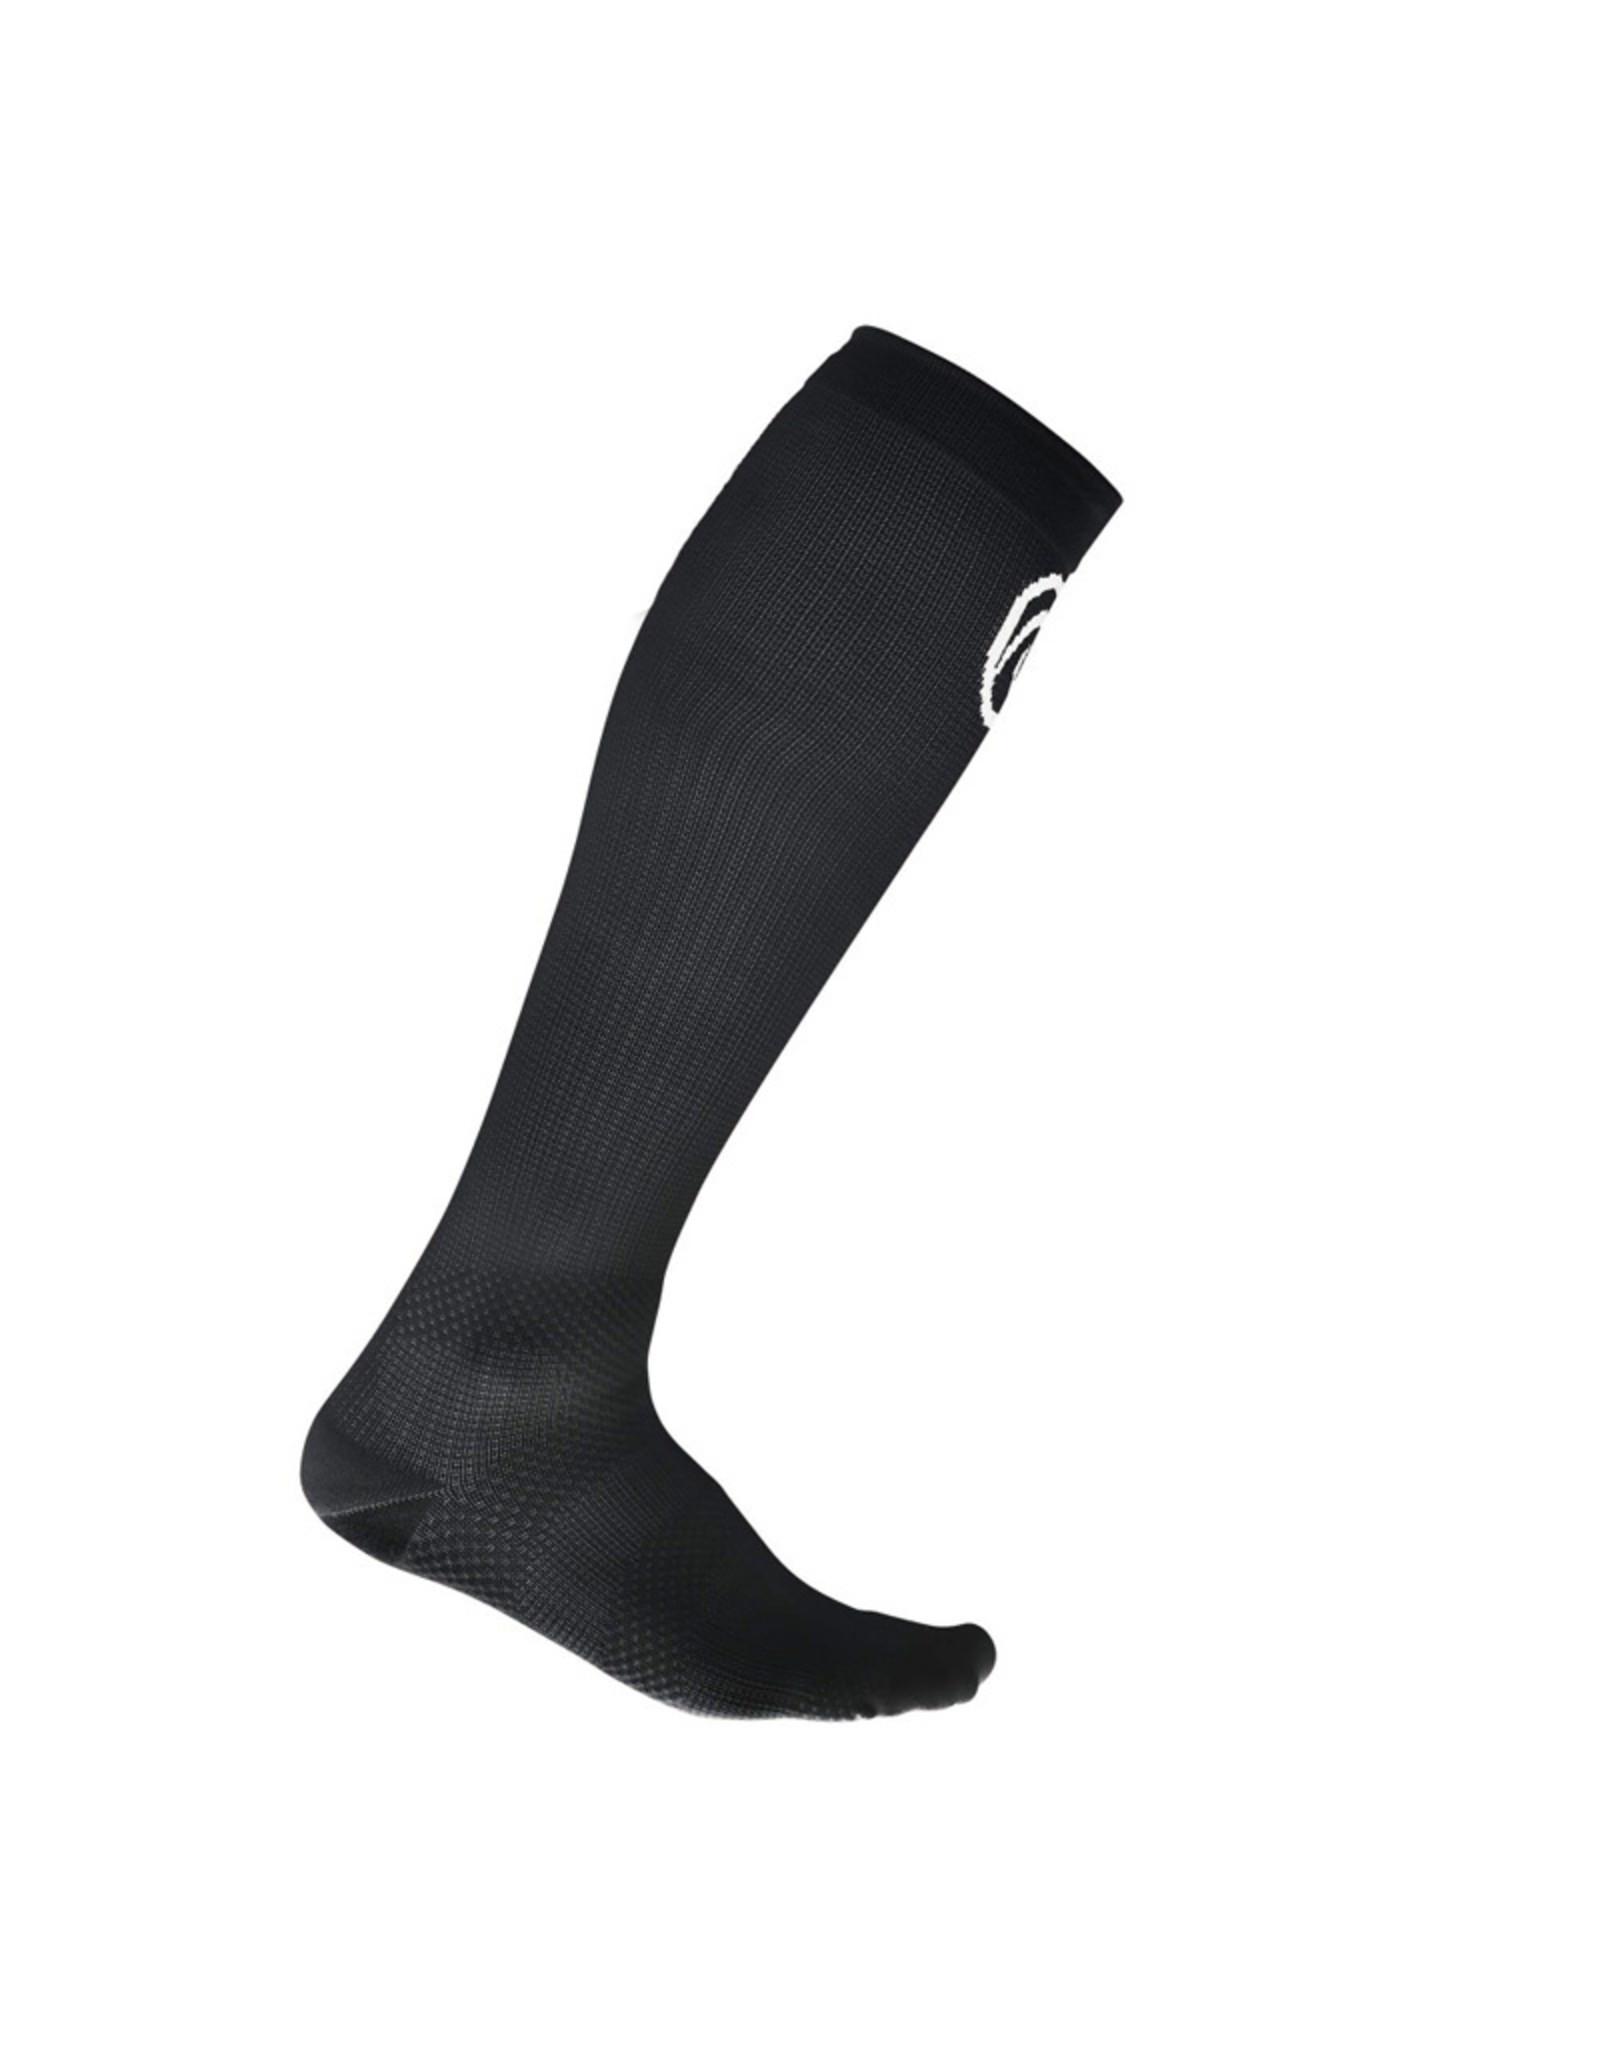 Rehband Qd Compression Socks Compressiesokken - Zwart